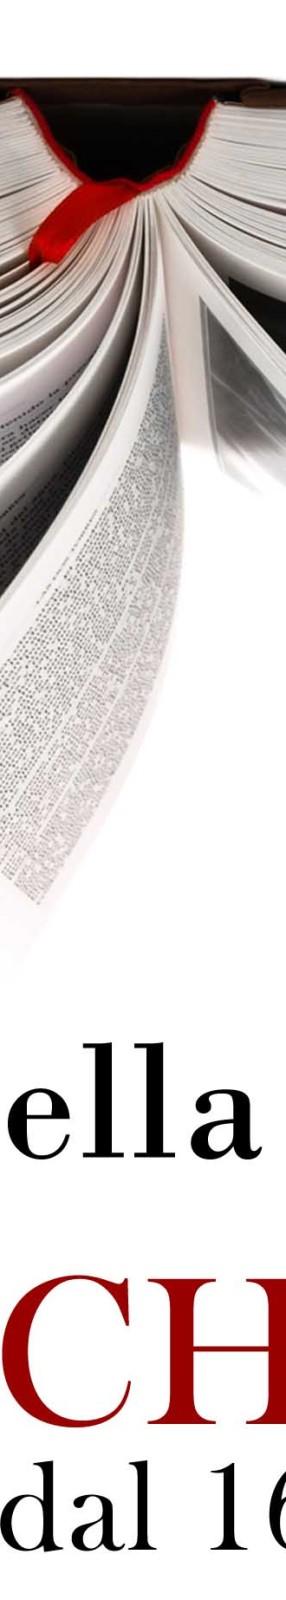 bianca torino che legge